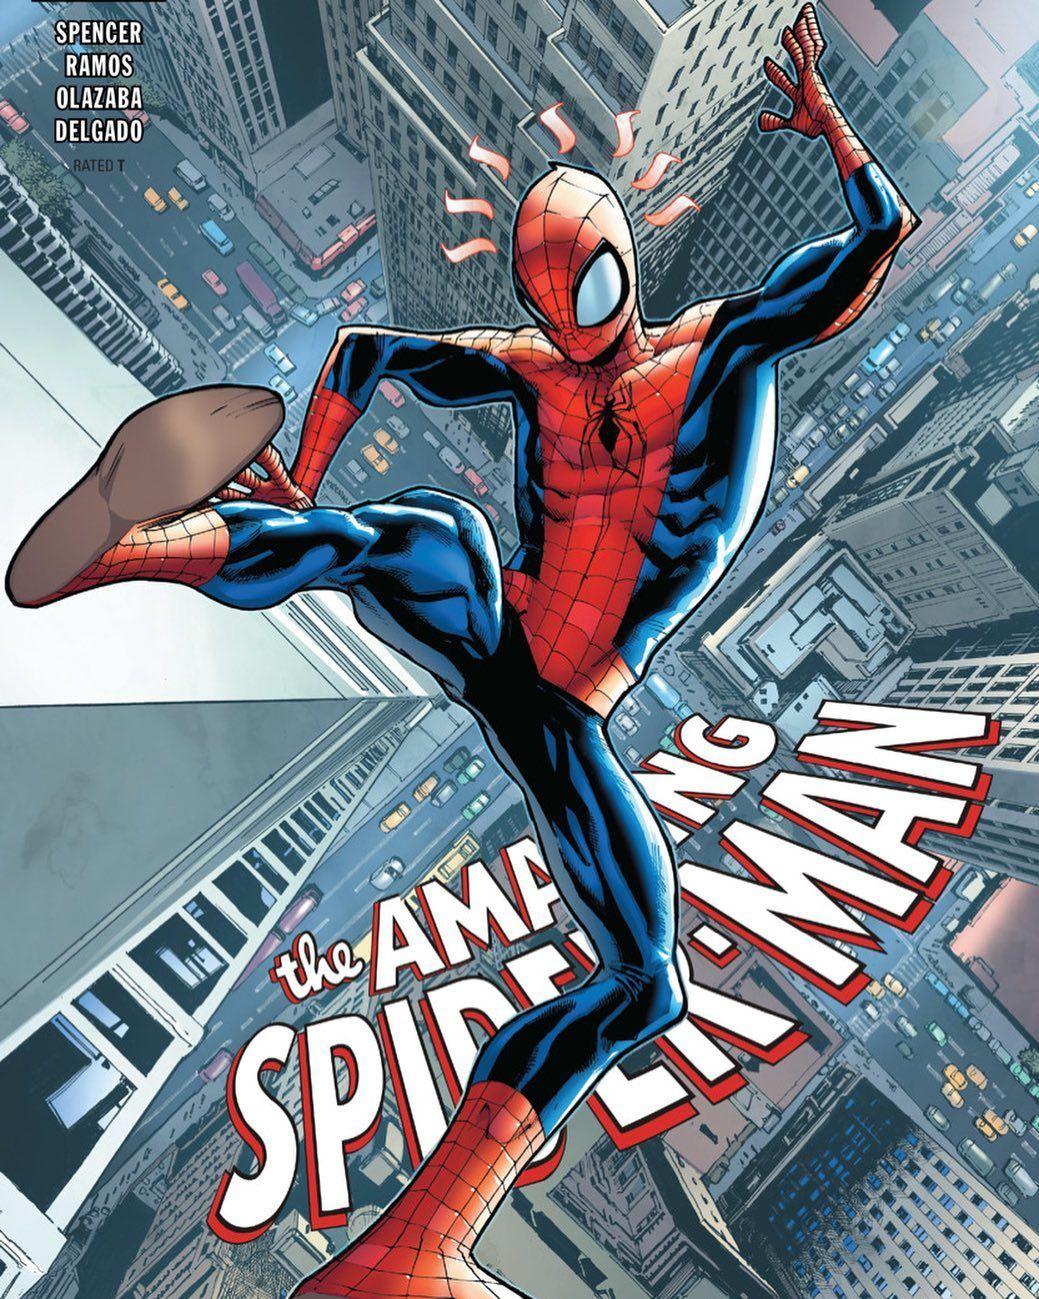 Free Falling The Amazing Spider-Man #8 Artist: Humberto Ramos (Aug 2019)